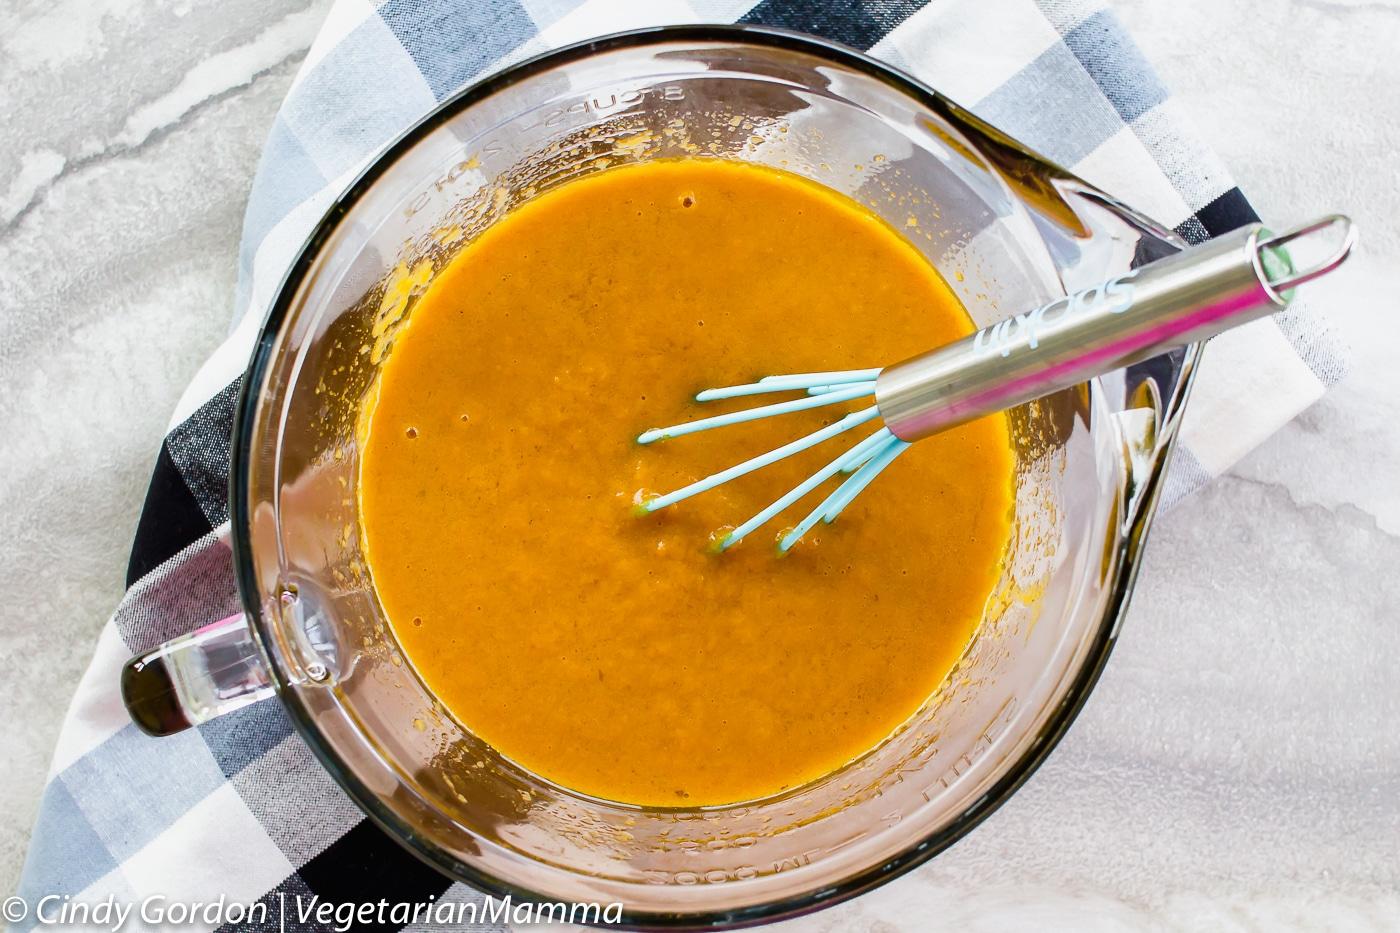 Wet ingredients for Gluten Free Pumpkin Bread